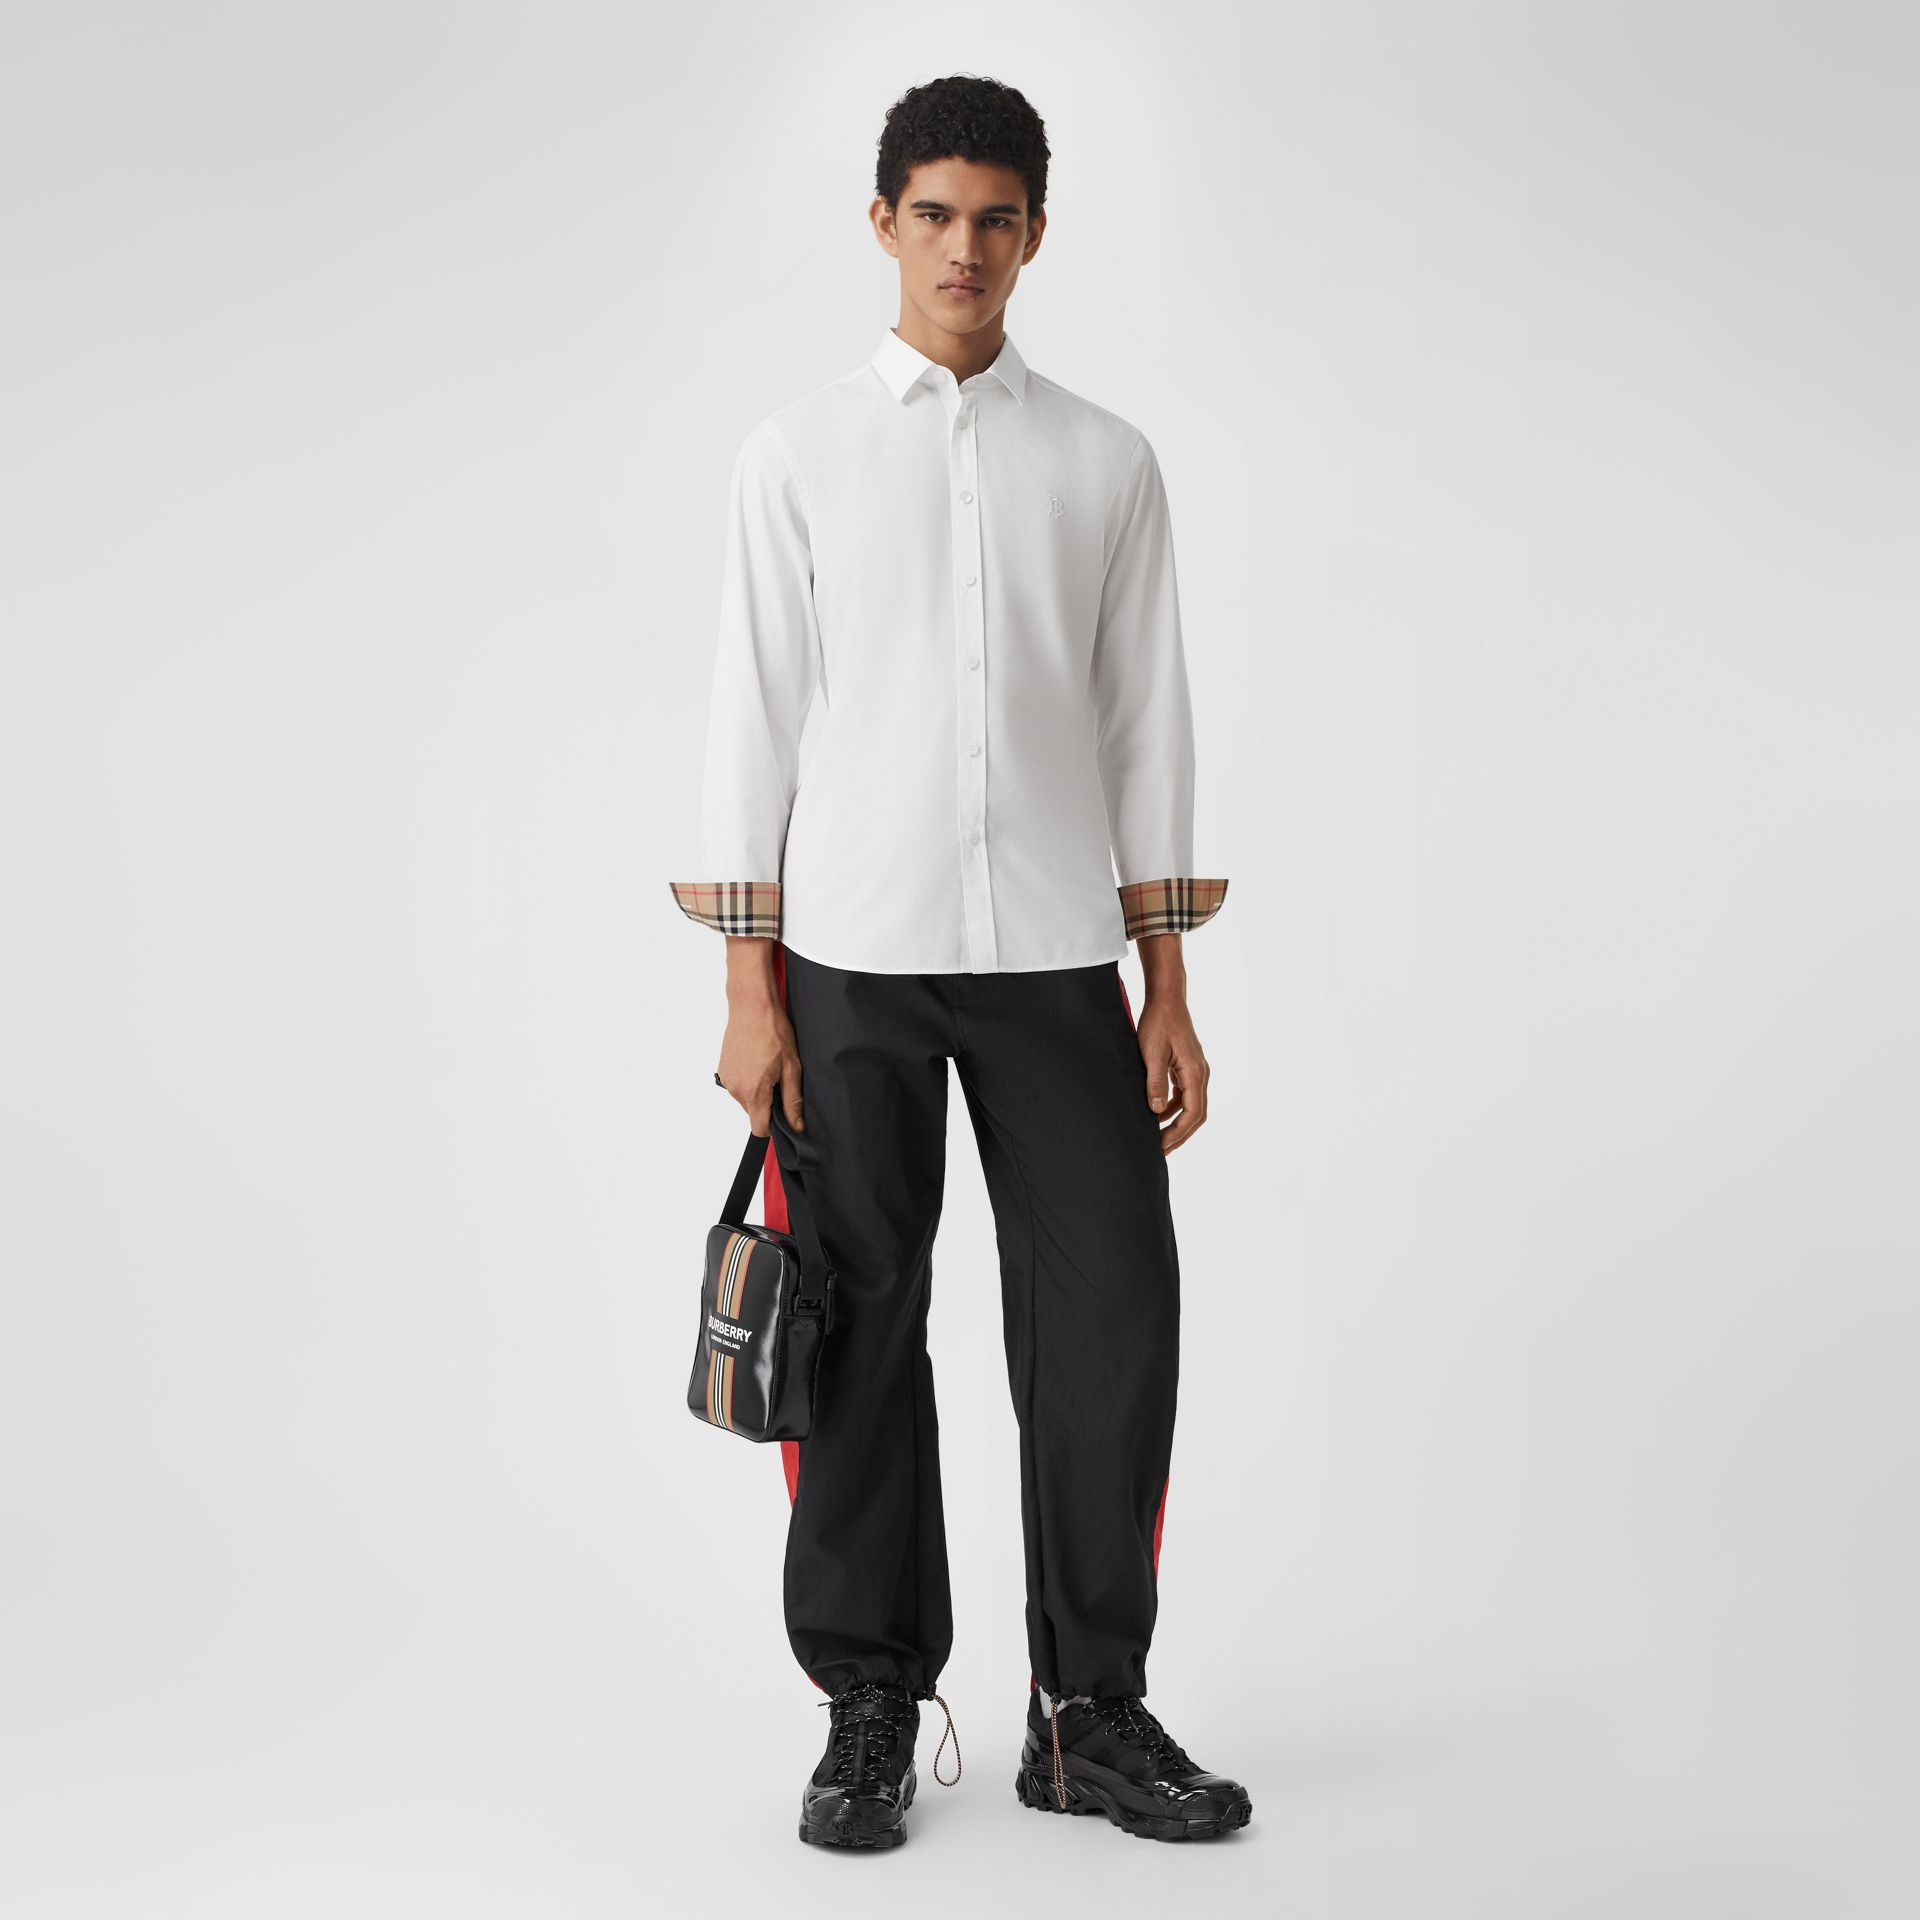 Slim Fit Monogram Motif Stretch Cotton Poplin Shirt in White - Men | Burberry United States - gallery image 5